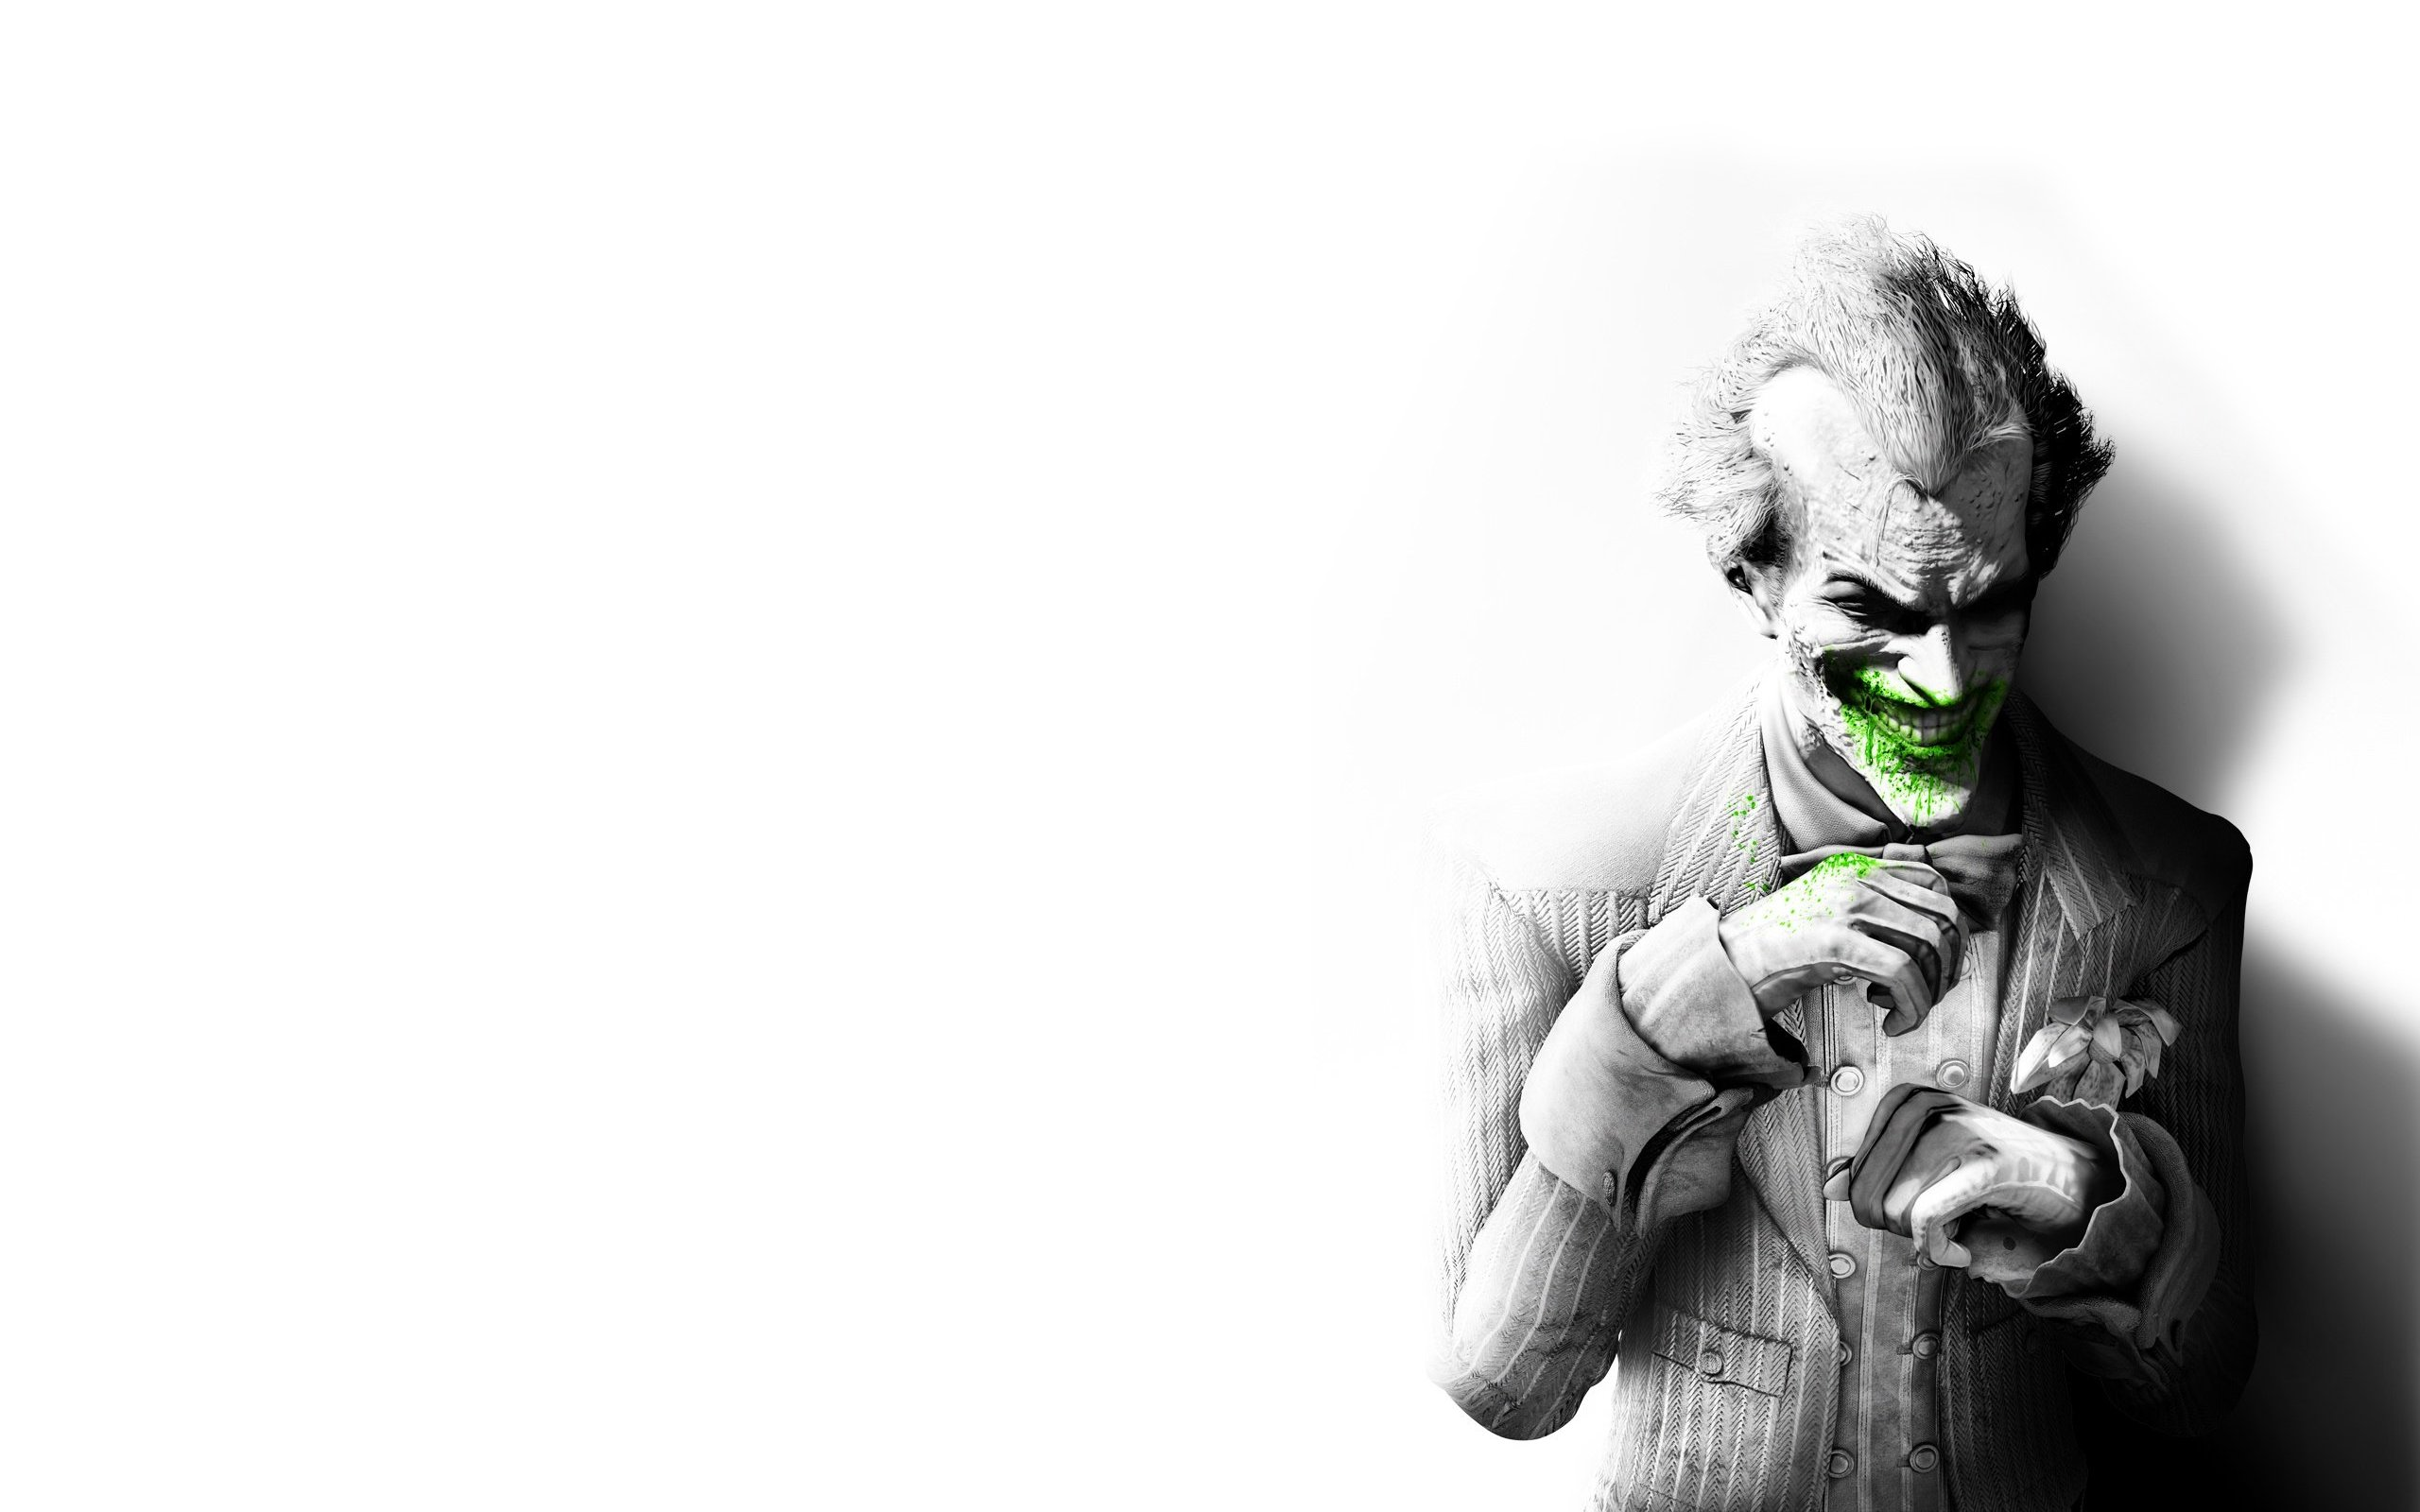 Batman Arkham City Full HD Wallpaper And Background Image